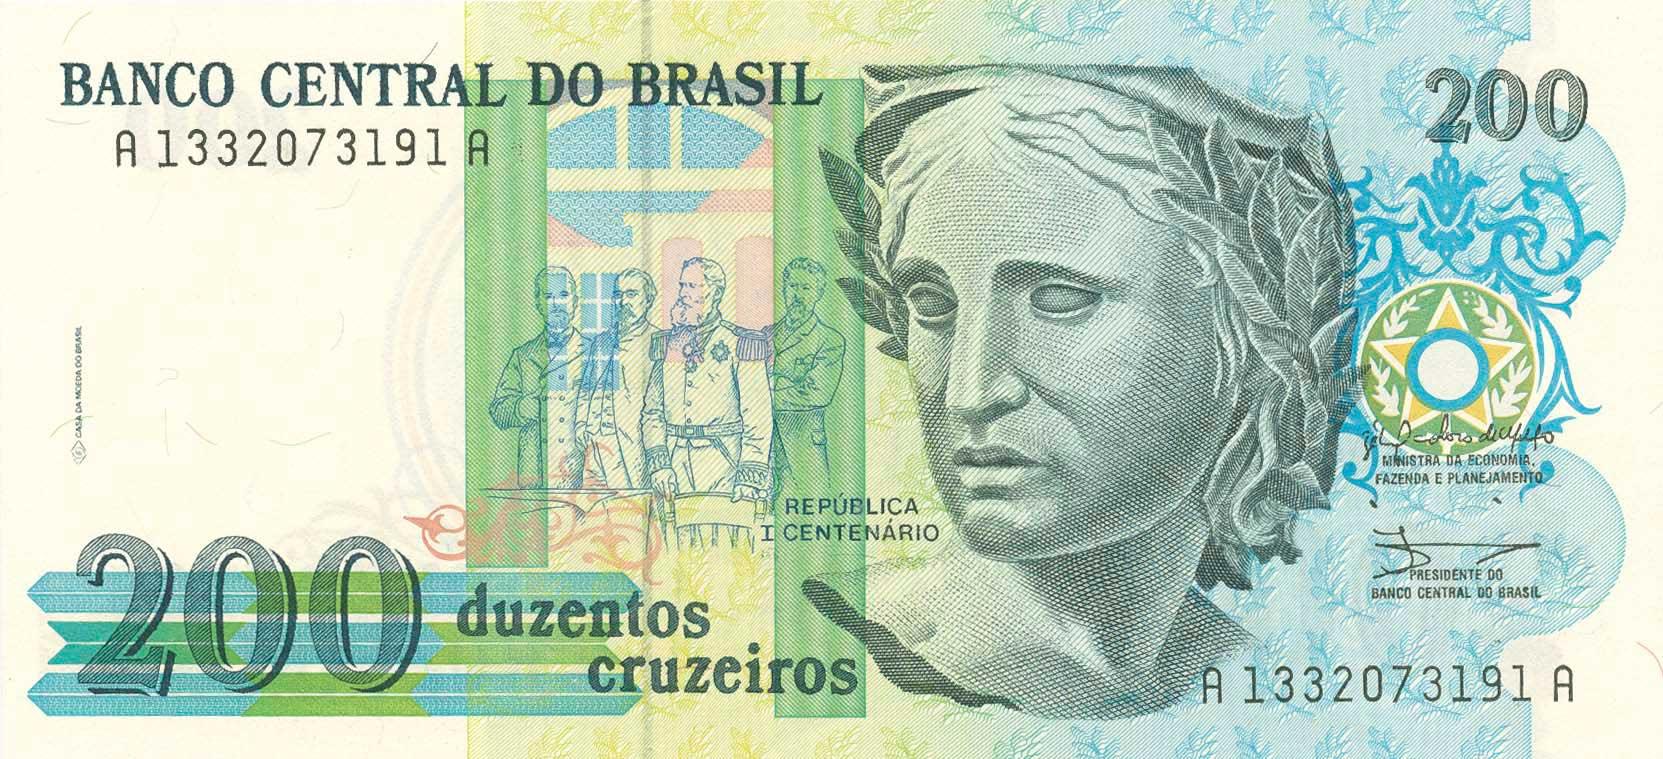 BRA-0229-a